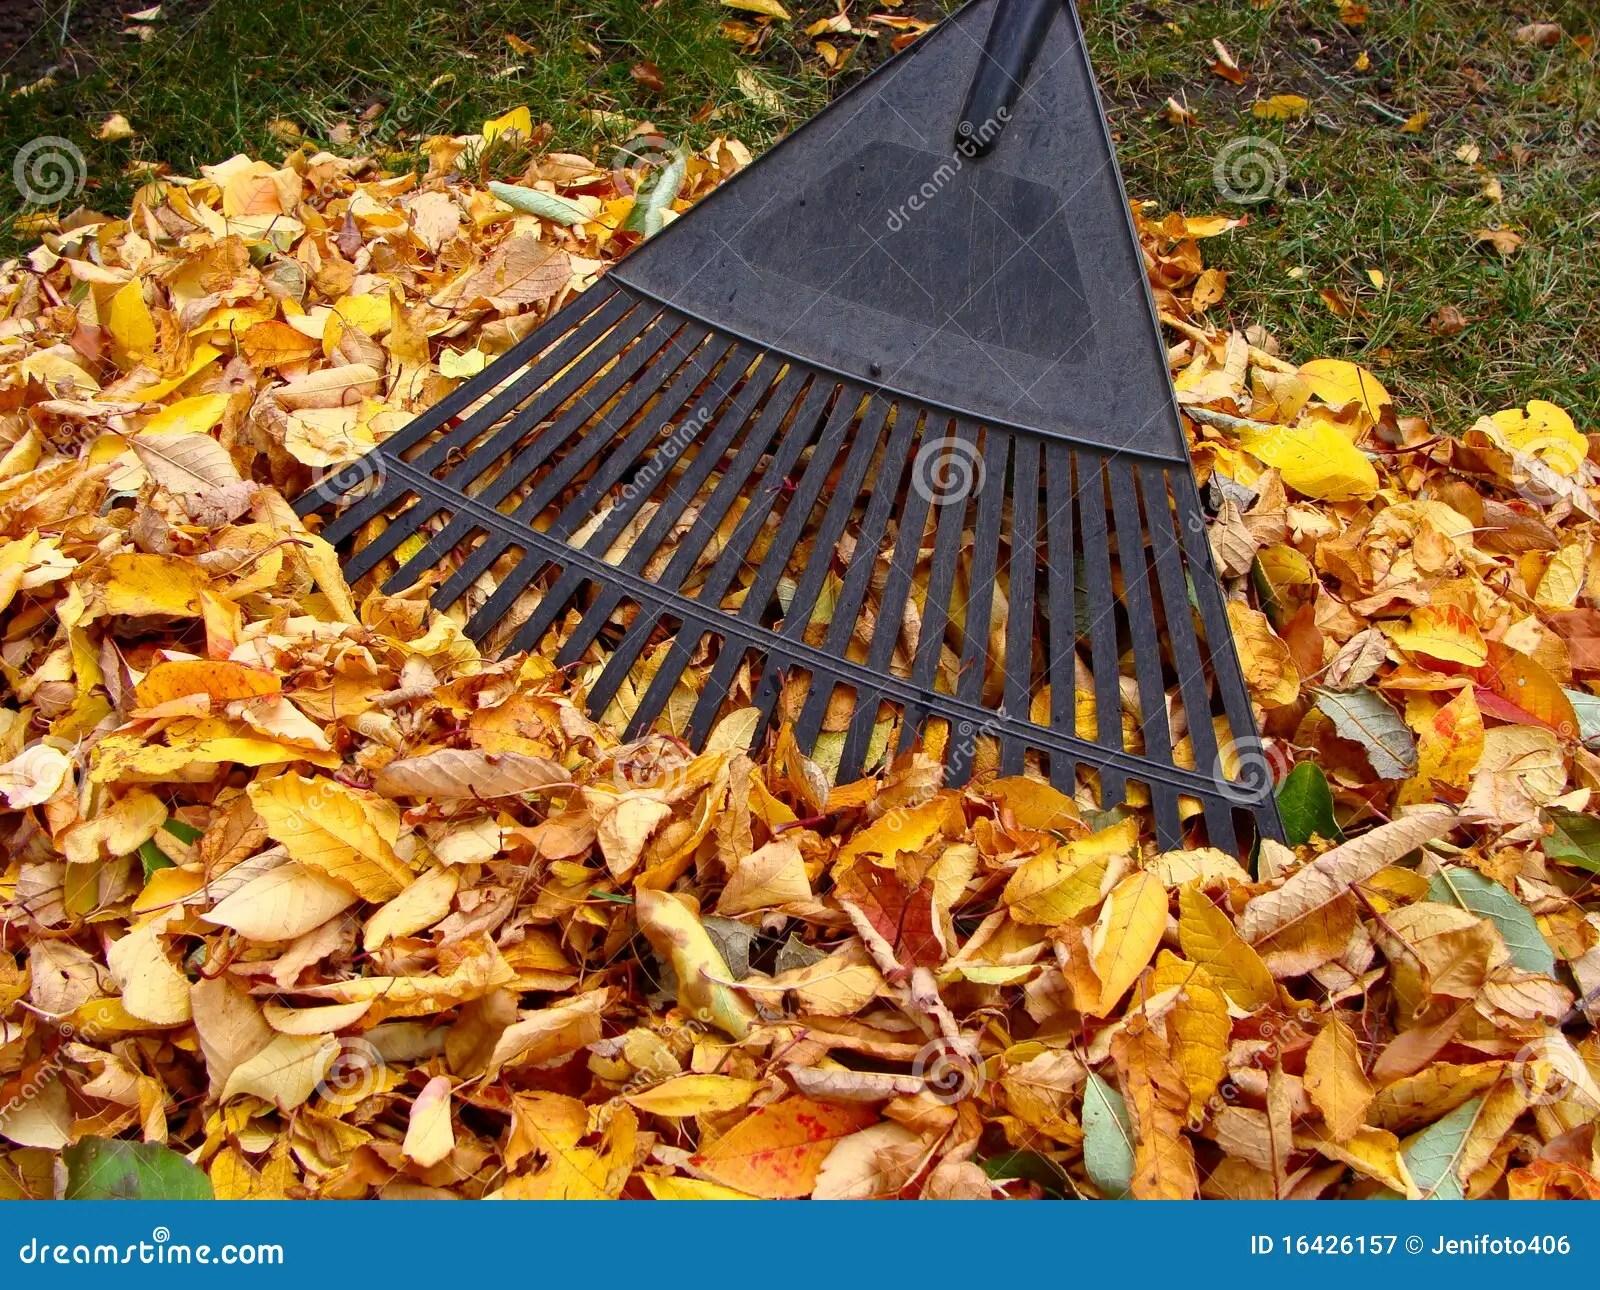 Autumn Tree Leaf Fall Animated Wallpaper Raking Autumn Leaves Royalty Free Stock Photography